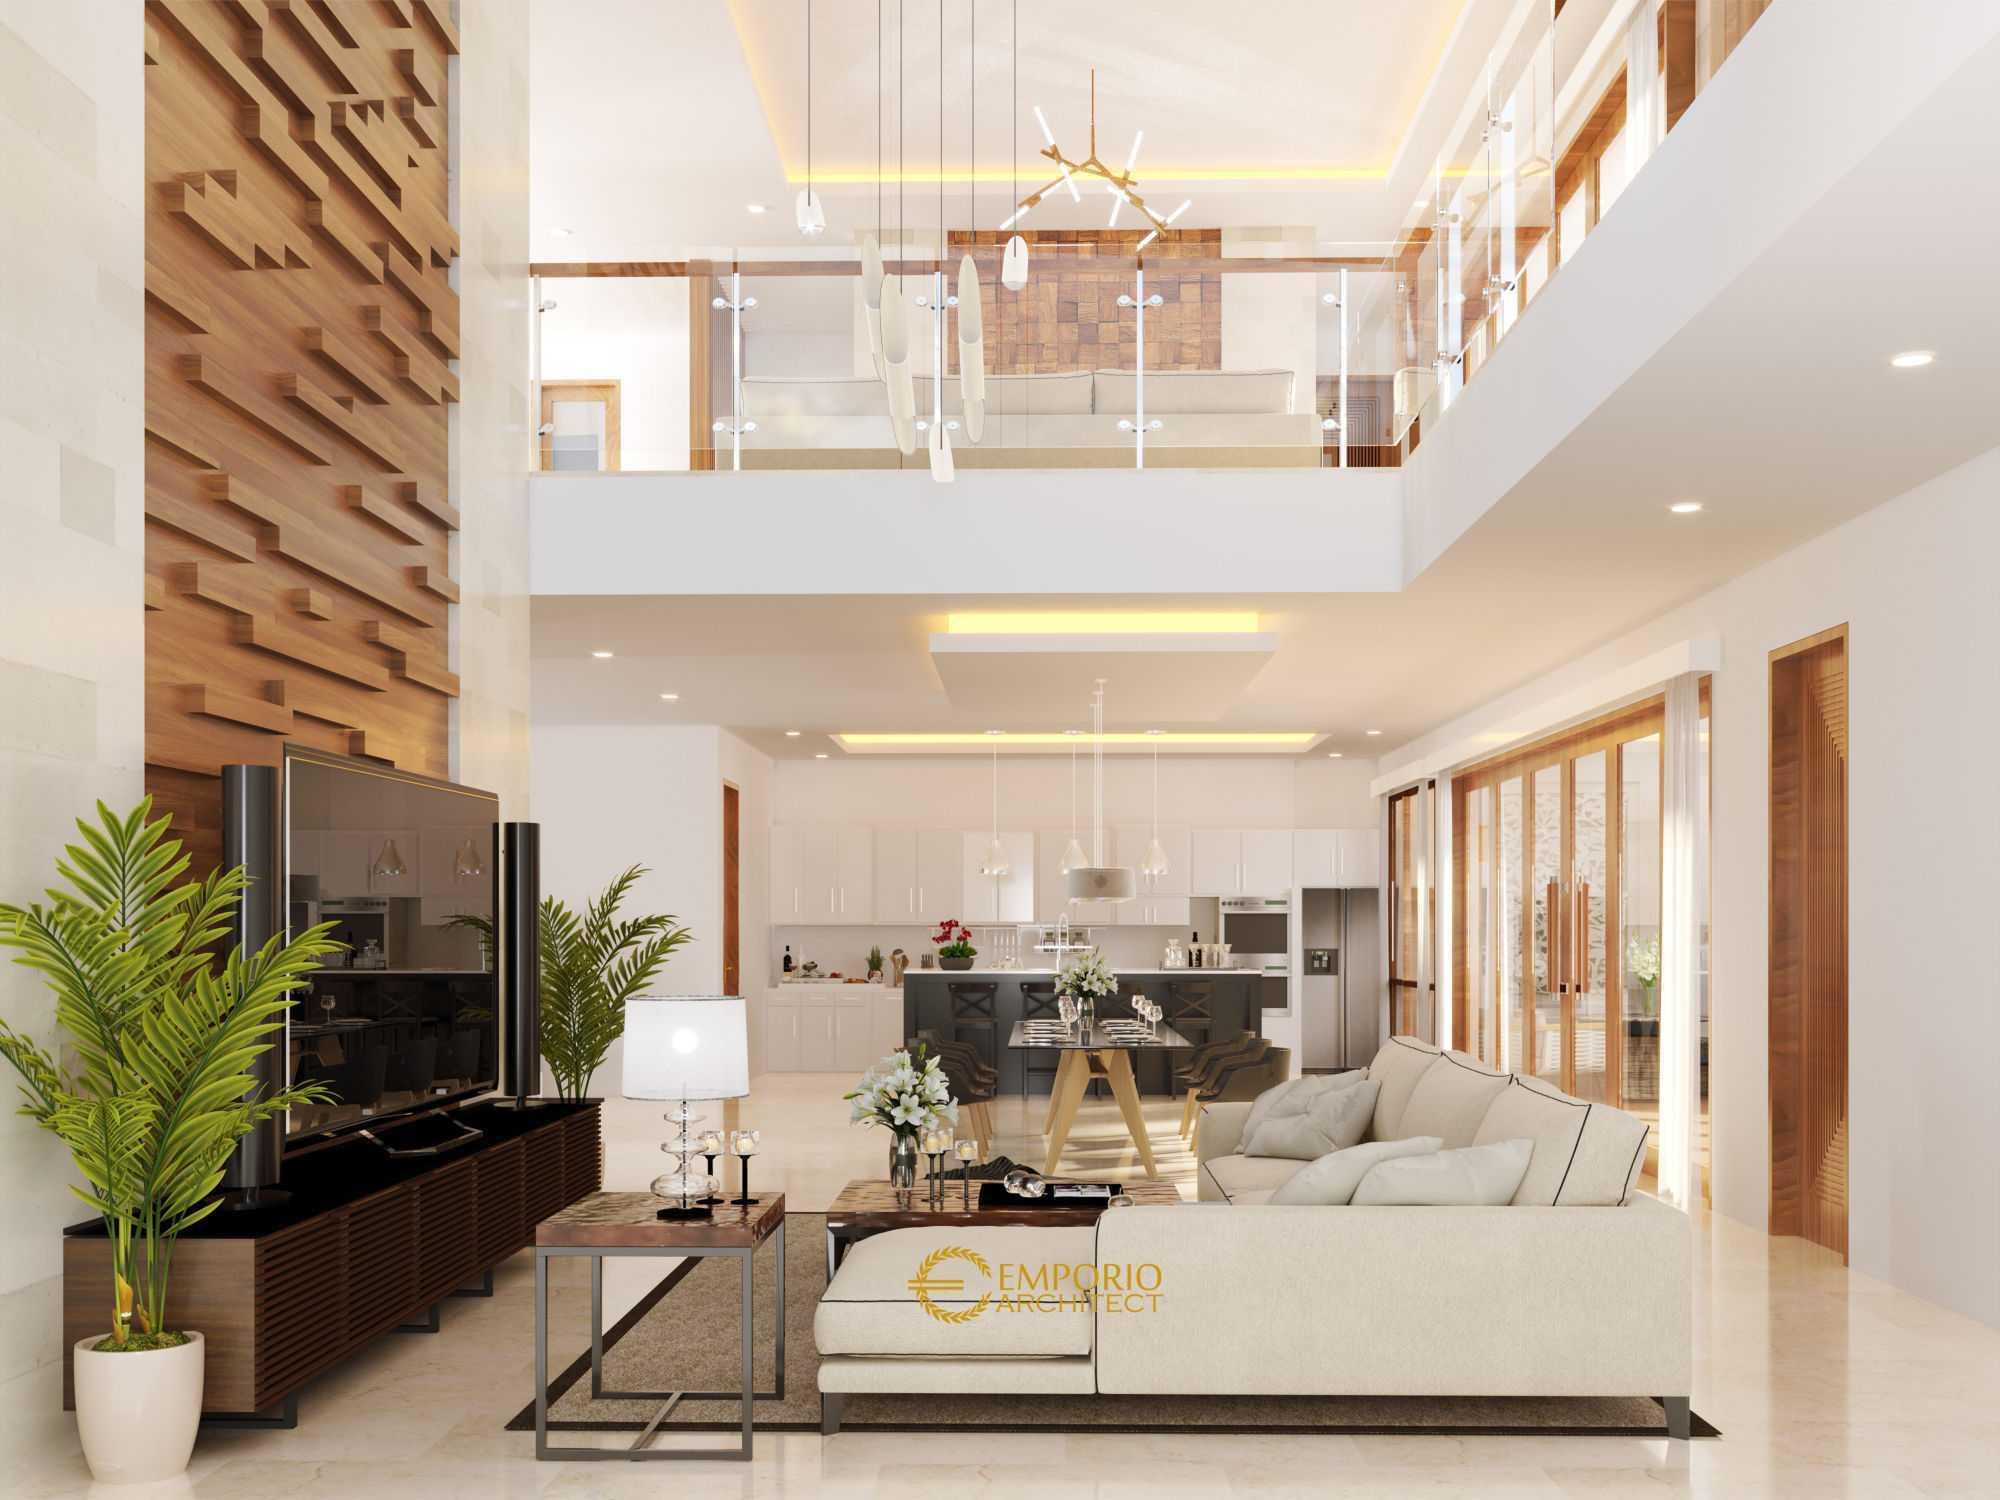 Emporio Architect Jasa Arsitek Makassar Desain Rumah Villa Bali Tropis 683 @ Makassar Makassar, Kota Makassar, Sulawesi Selatan, Indonesia Makassar, Kota Makassar, Sulawesi Selatan, Indonesia Emporio-Architect-Jasa-Arsitek-Makassar-Desain-Rumah-Villa-Bali-Tropis-683-Makassar   81775